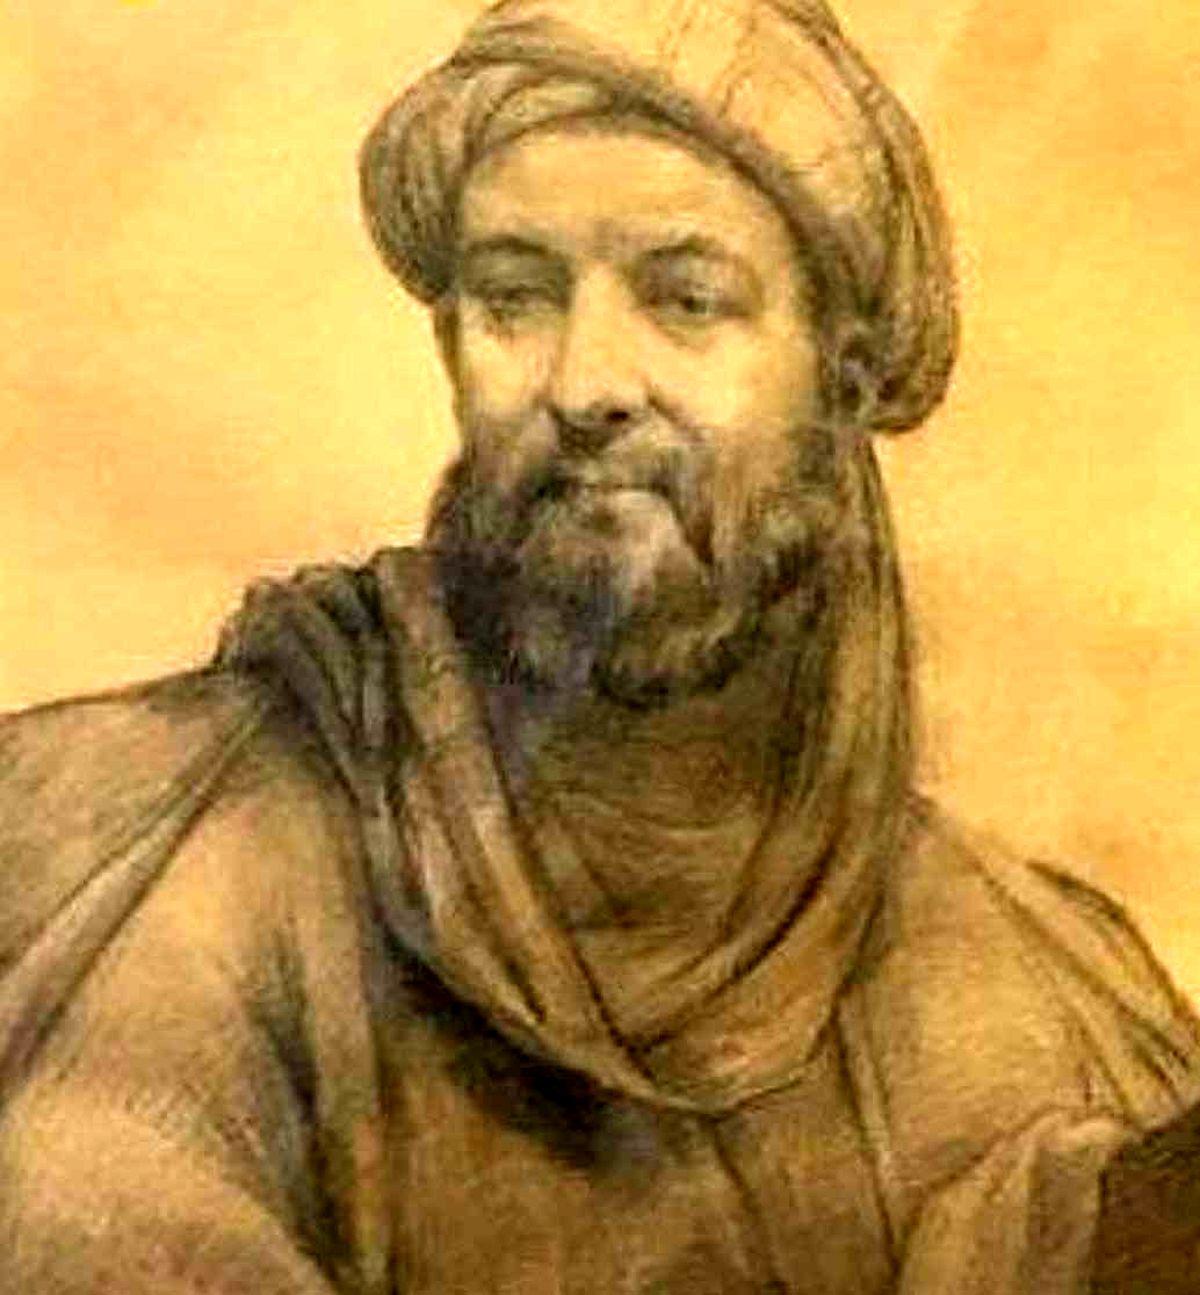 عکس واقعی حکیم شیخ الرئیس بوعلی سینا